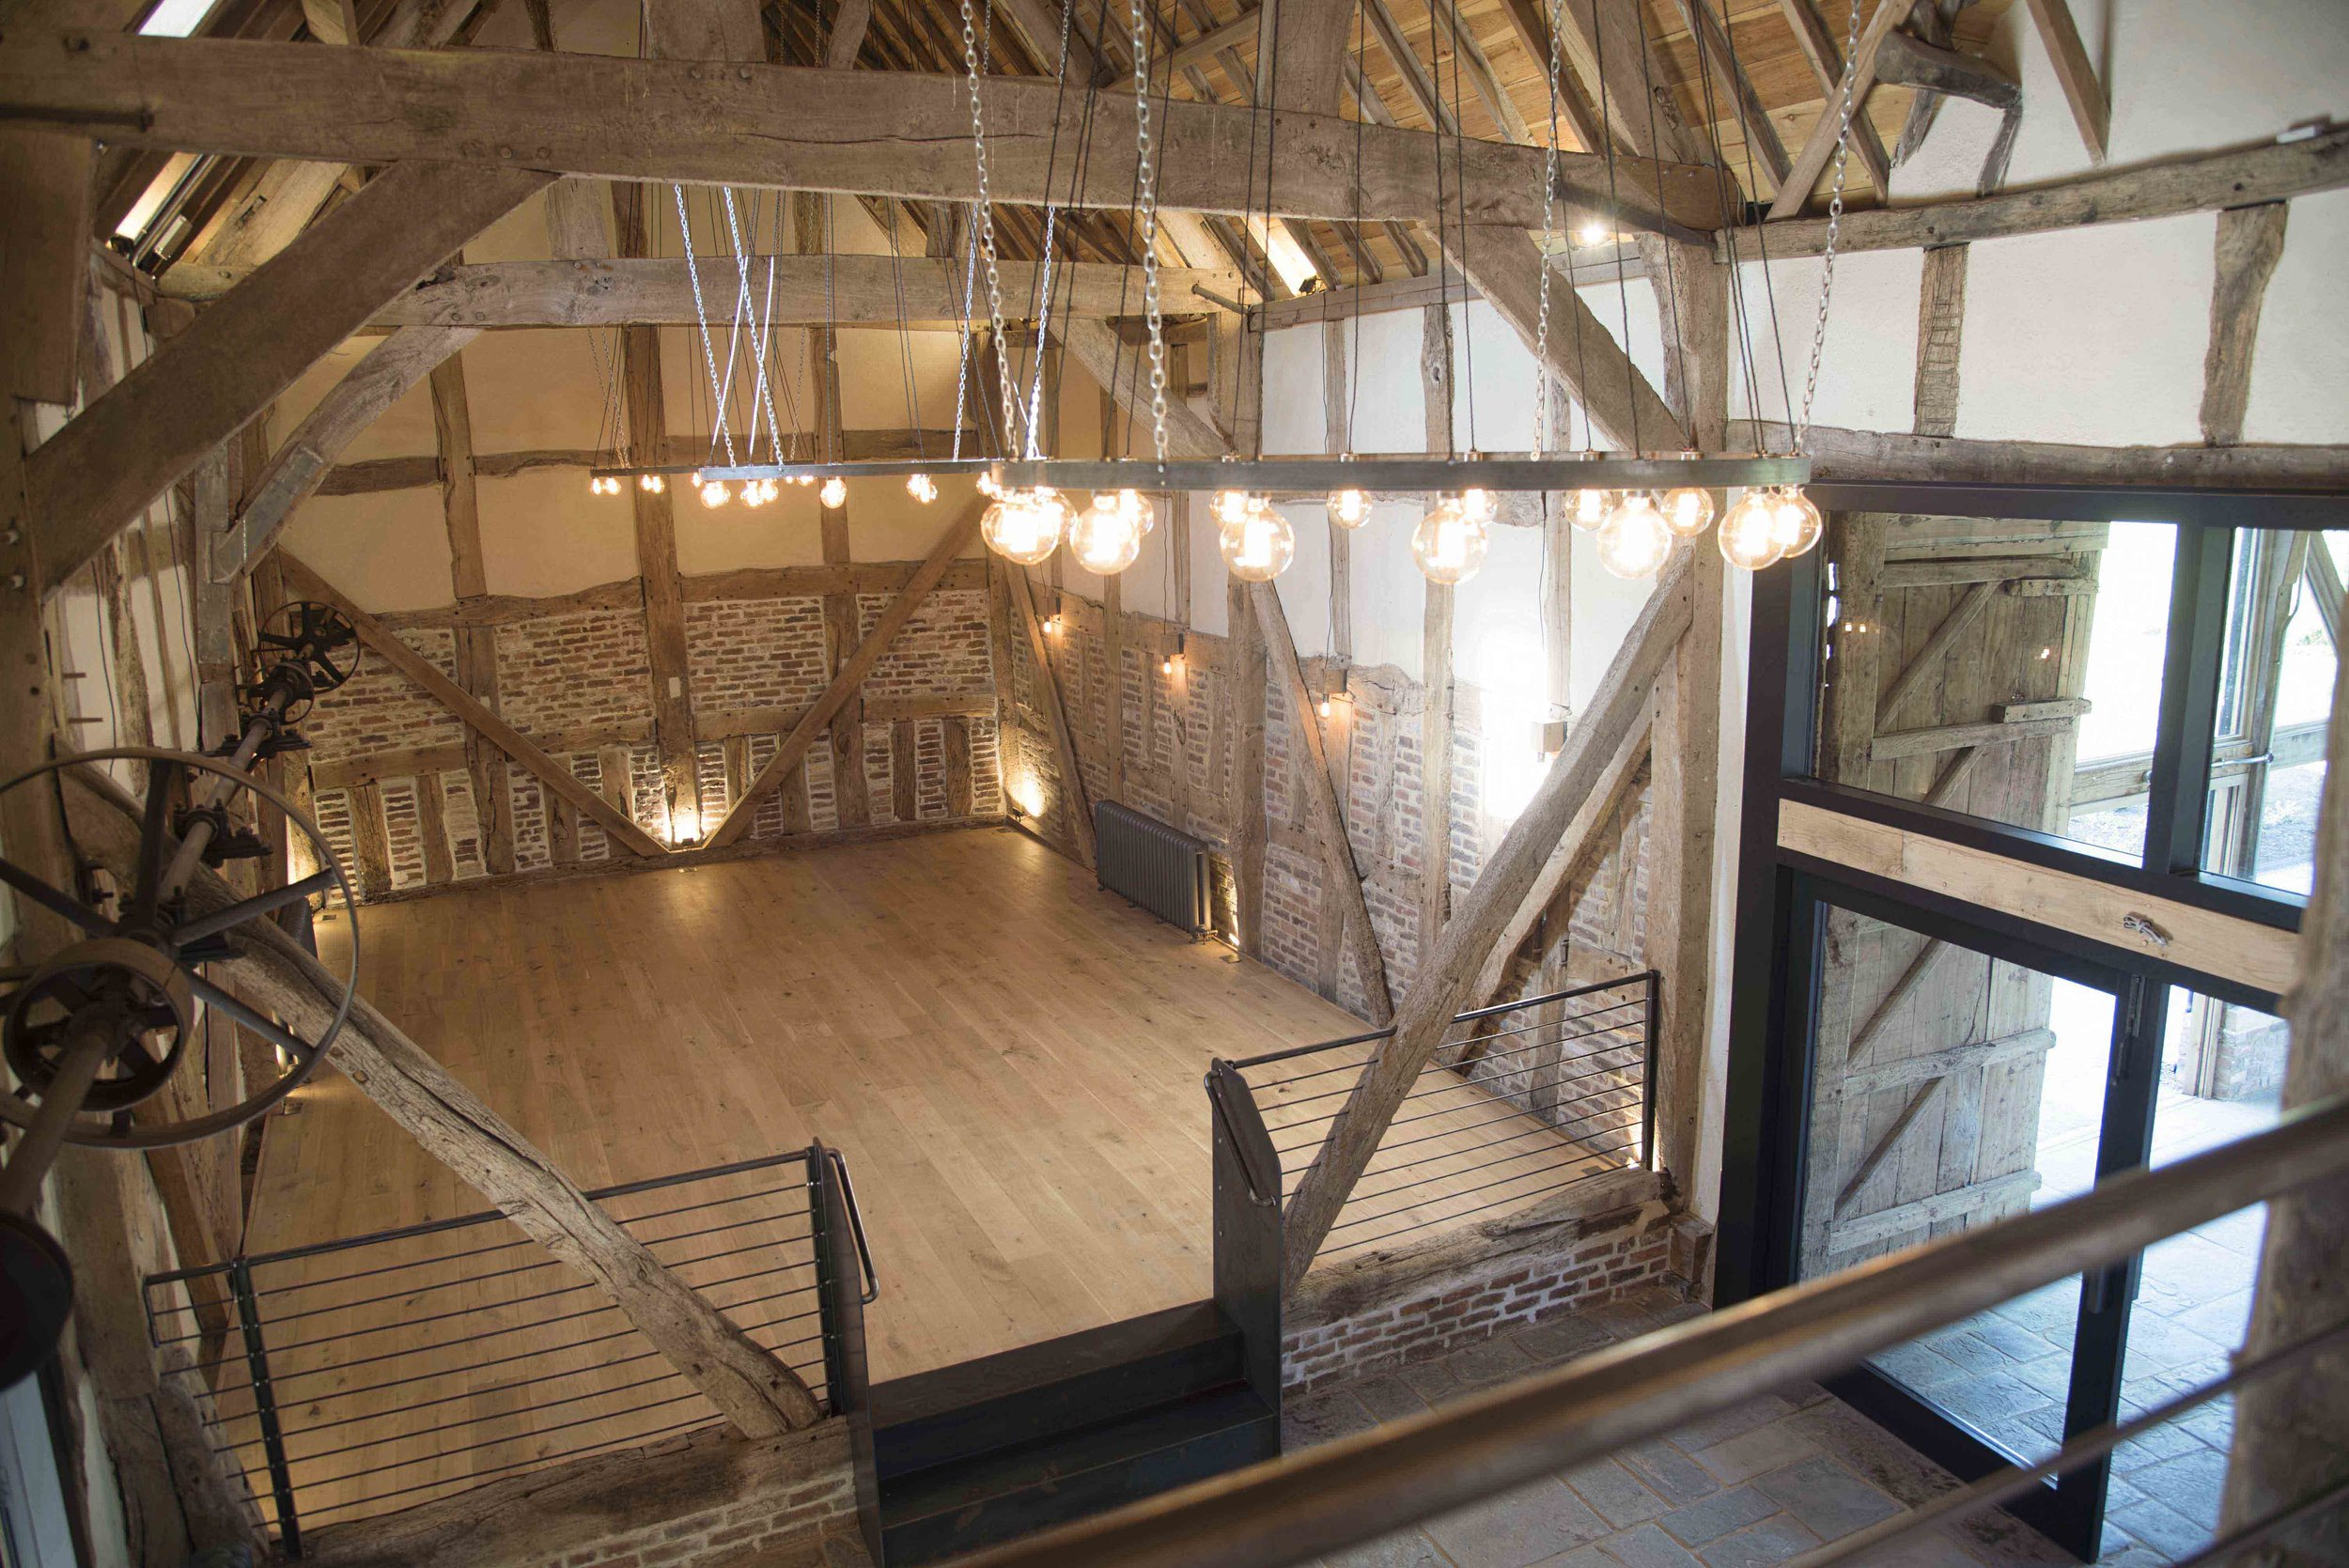 High viewpoint of the Threshing Barn at Barns and Yard Wedding Venue sharper.jpg